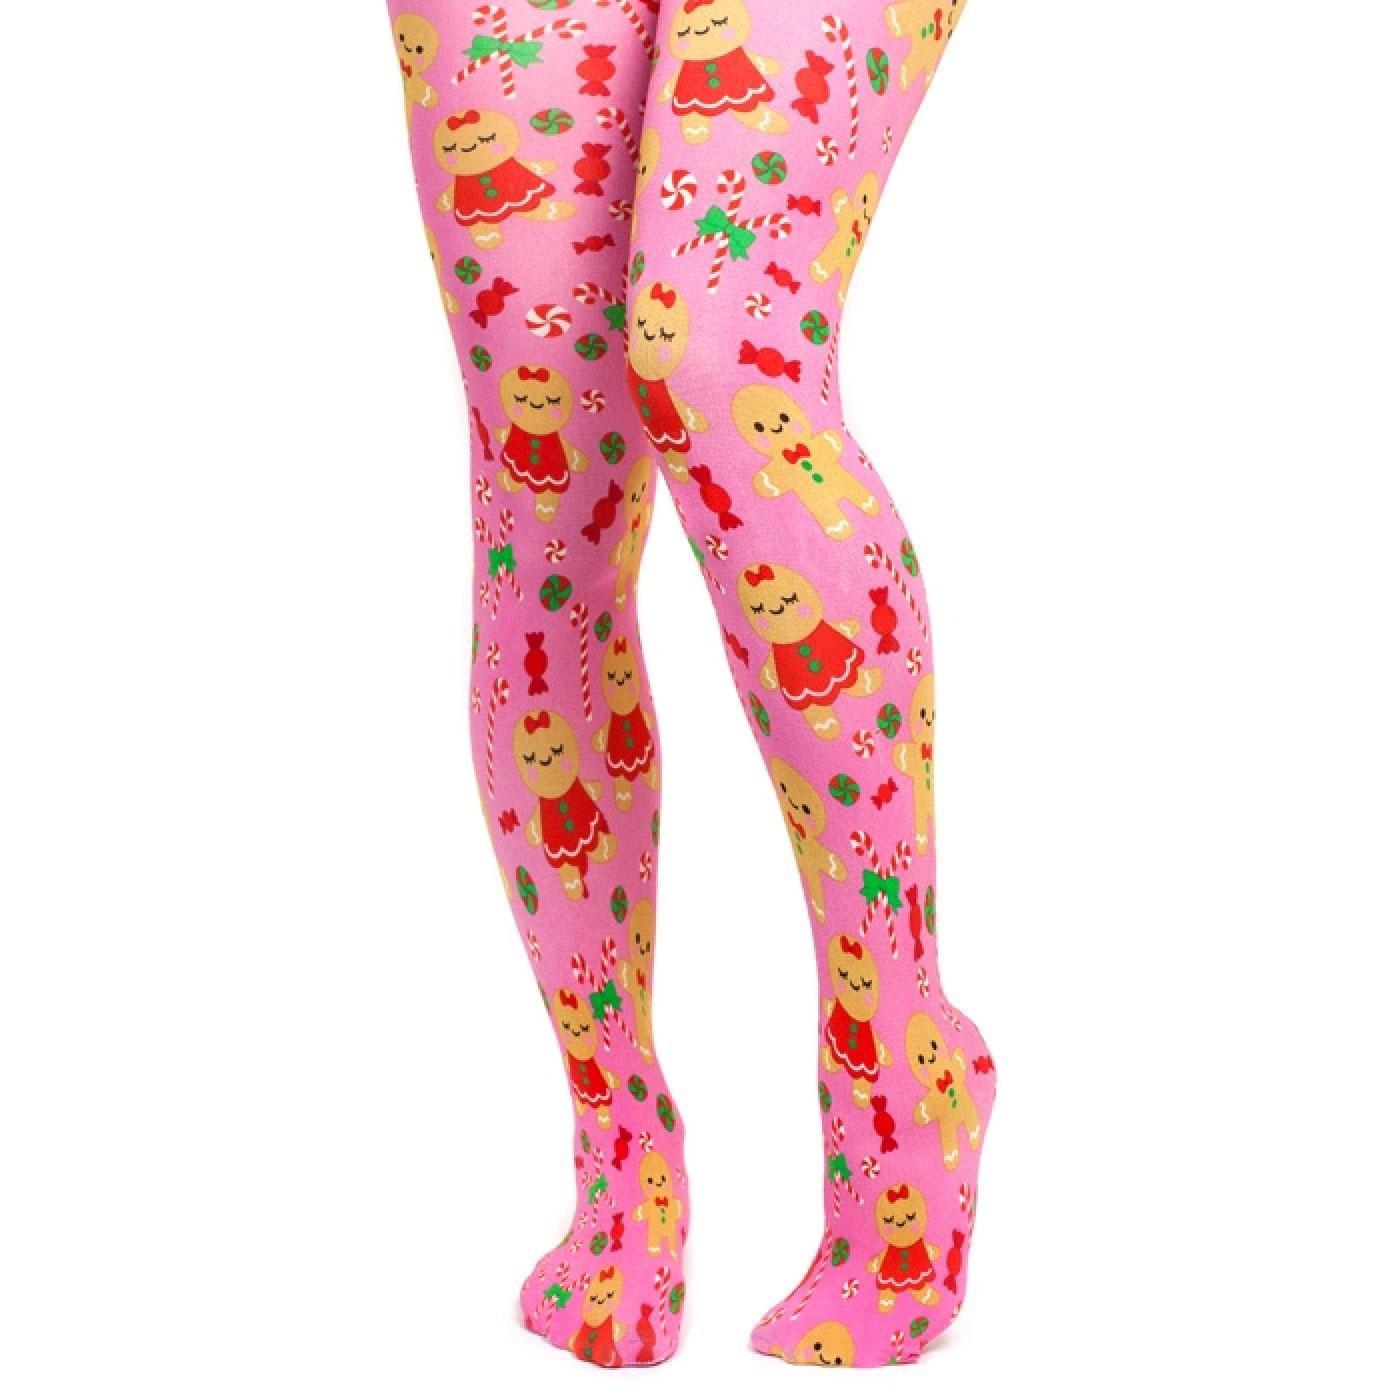 Gingerbread People IRREGULAR CHOICE Tights Pink